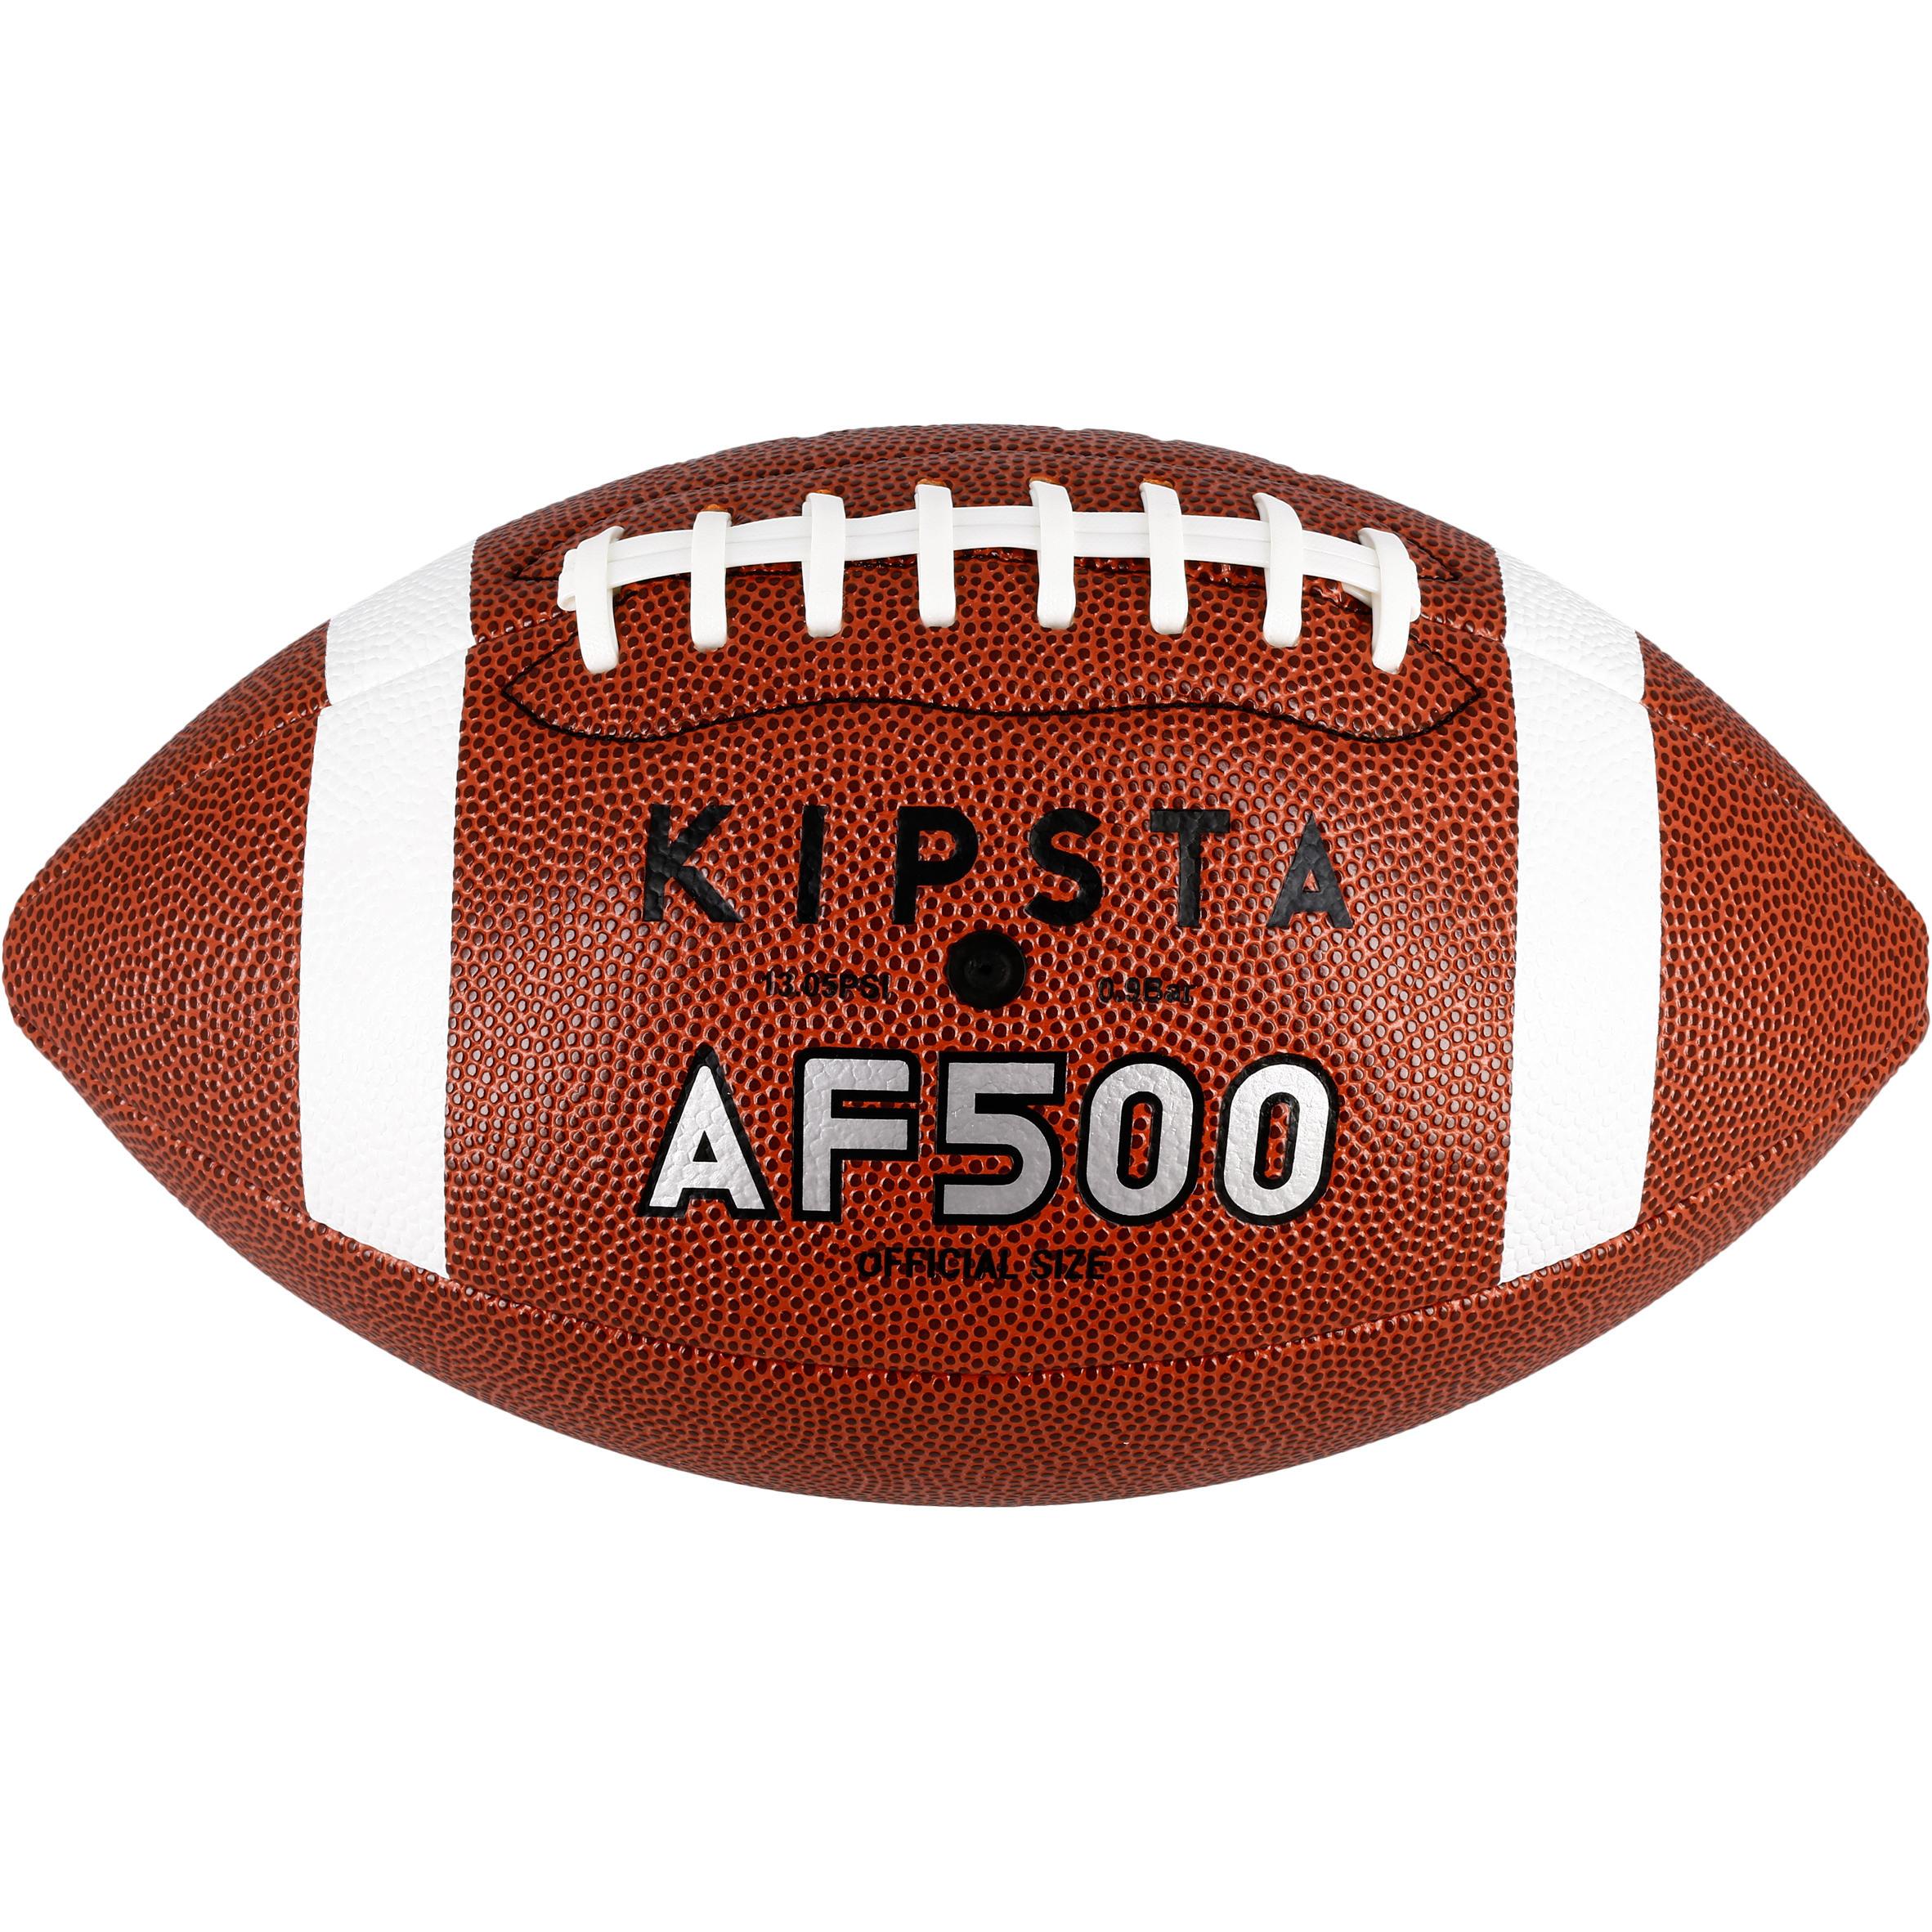 AF500 Official Size Football - Brown